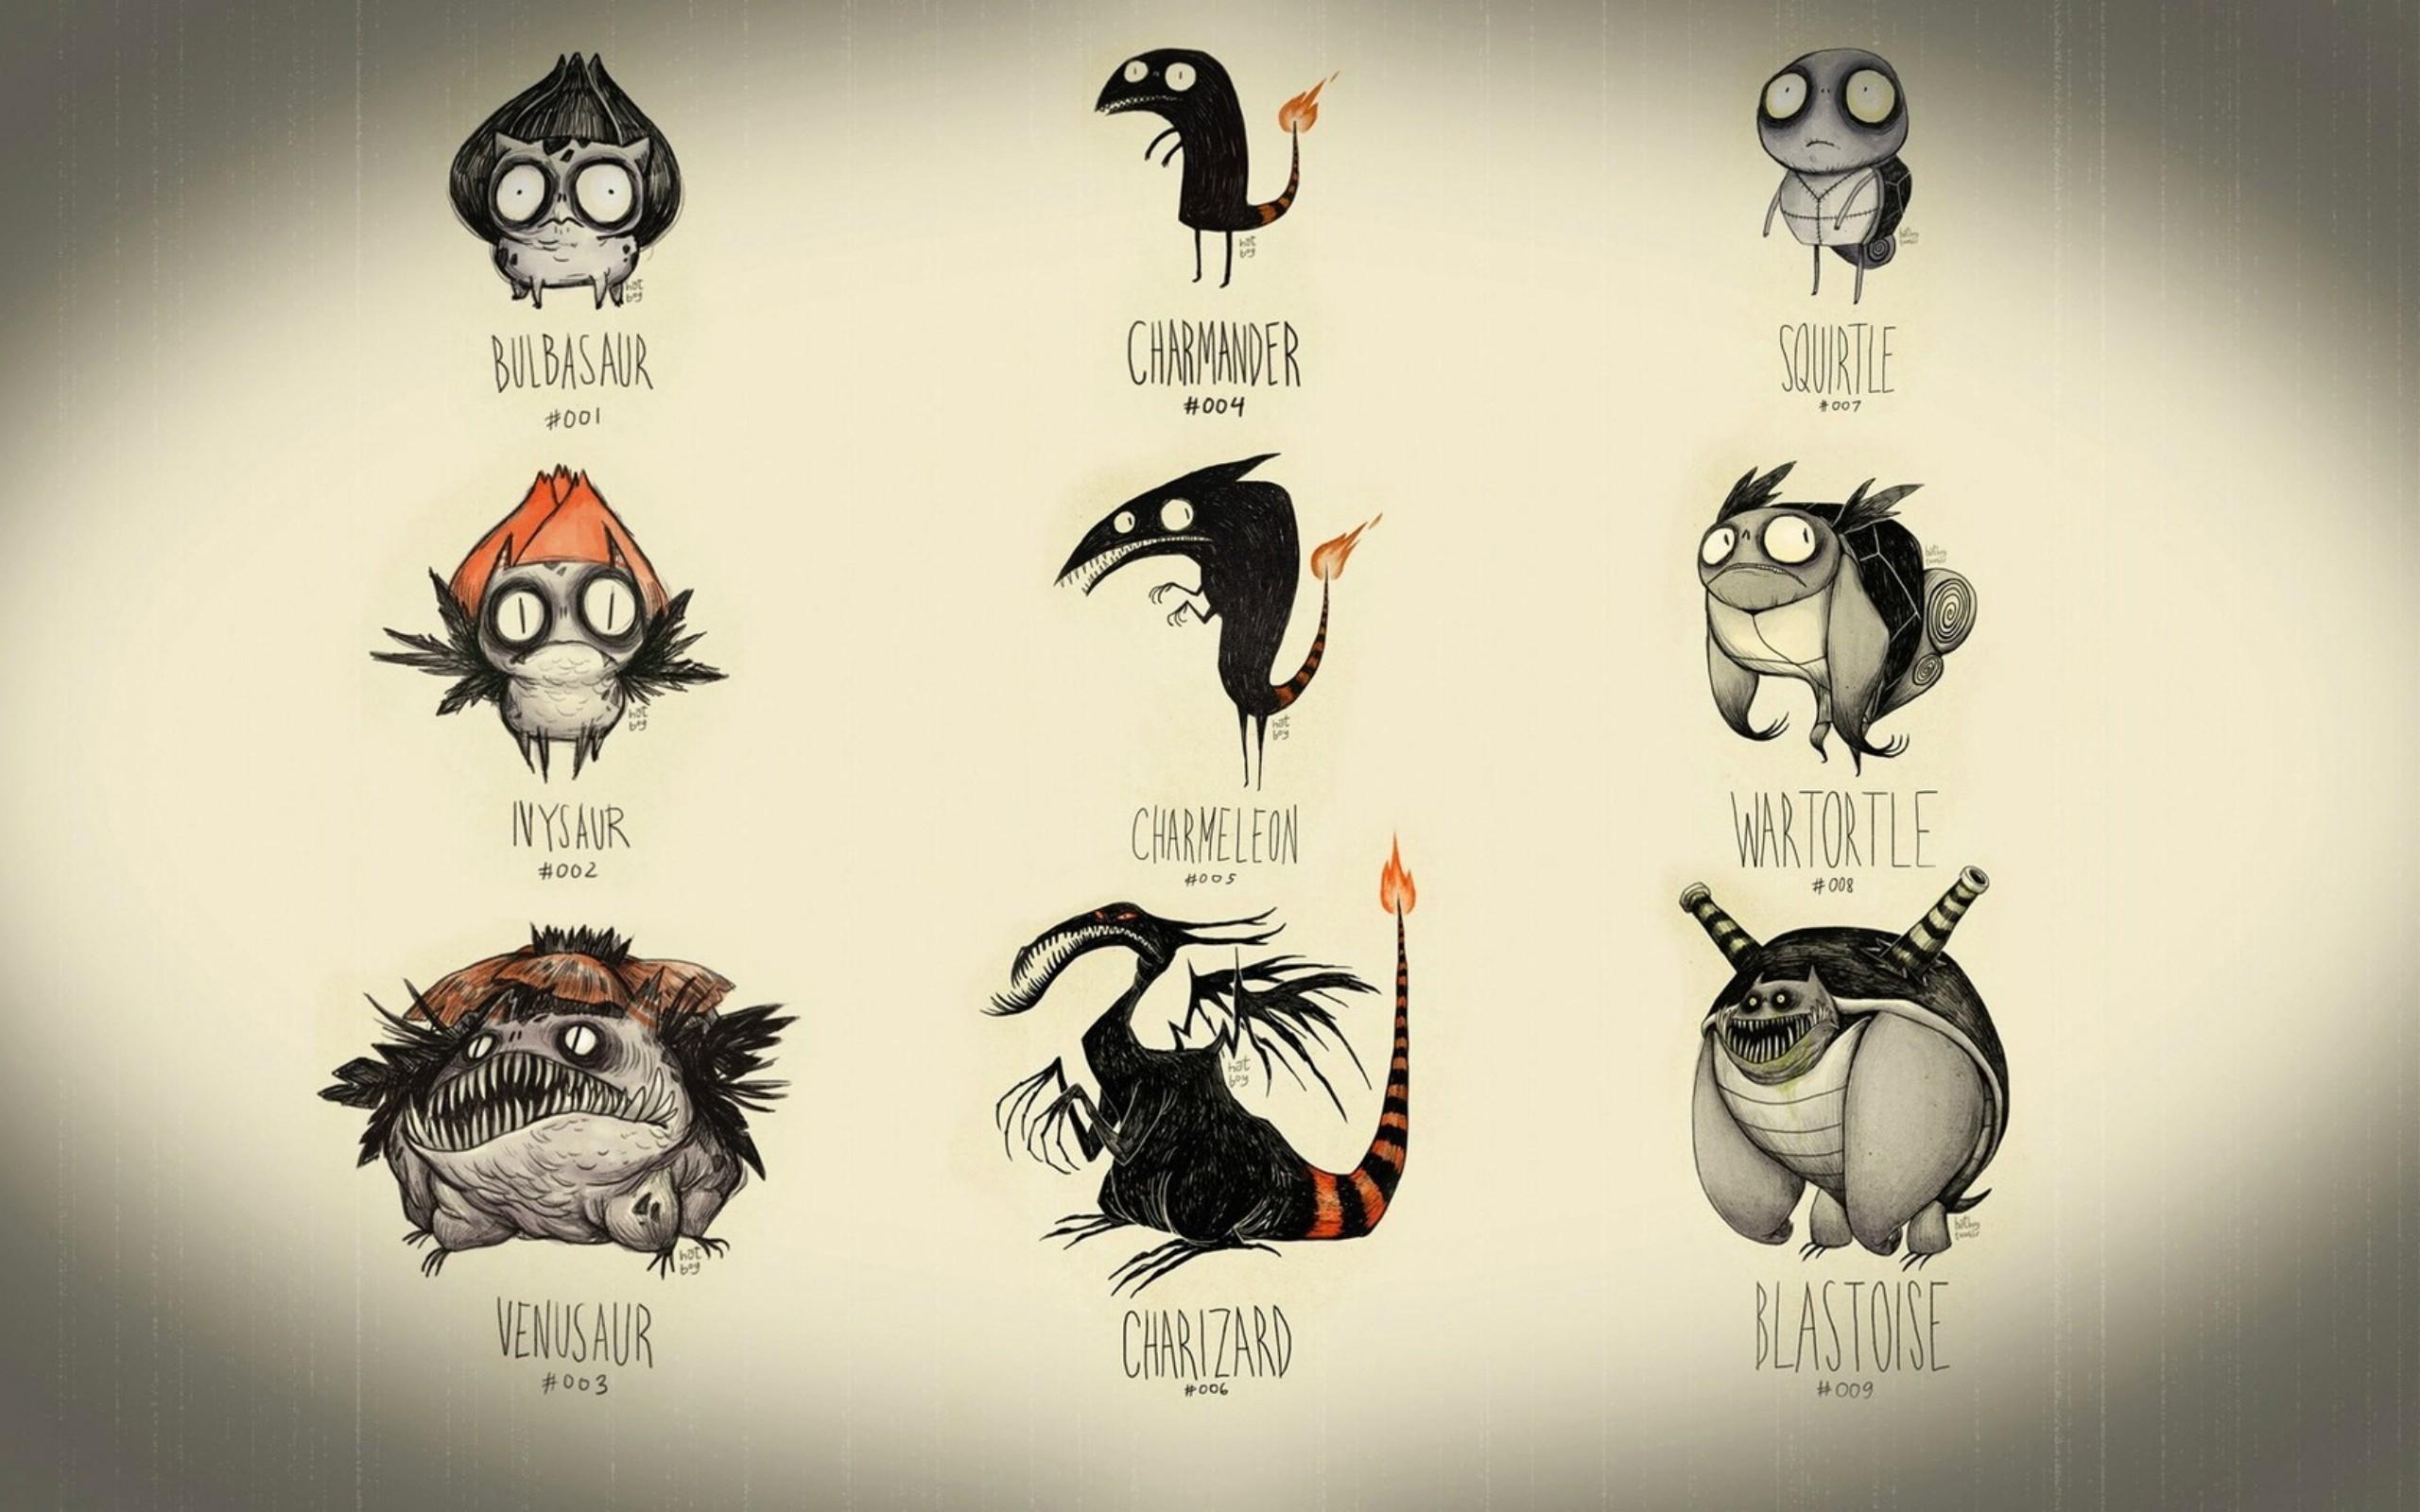 Tim burton wallpaper Group · Pokemon CharizardTim …